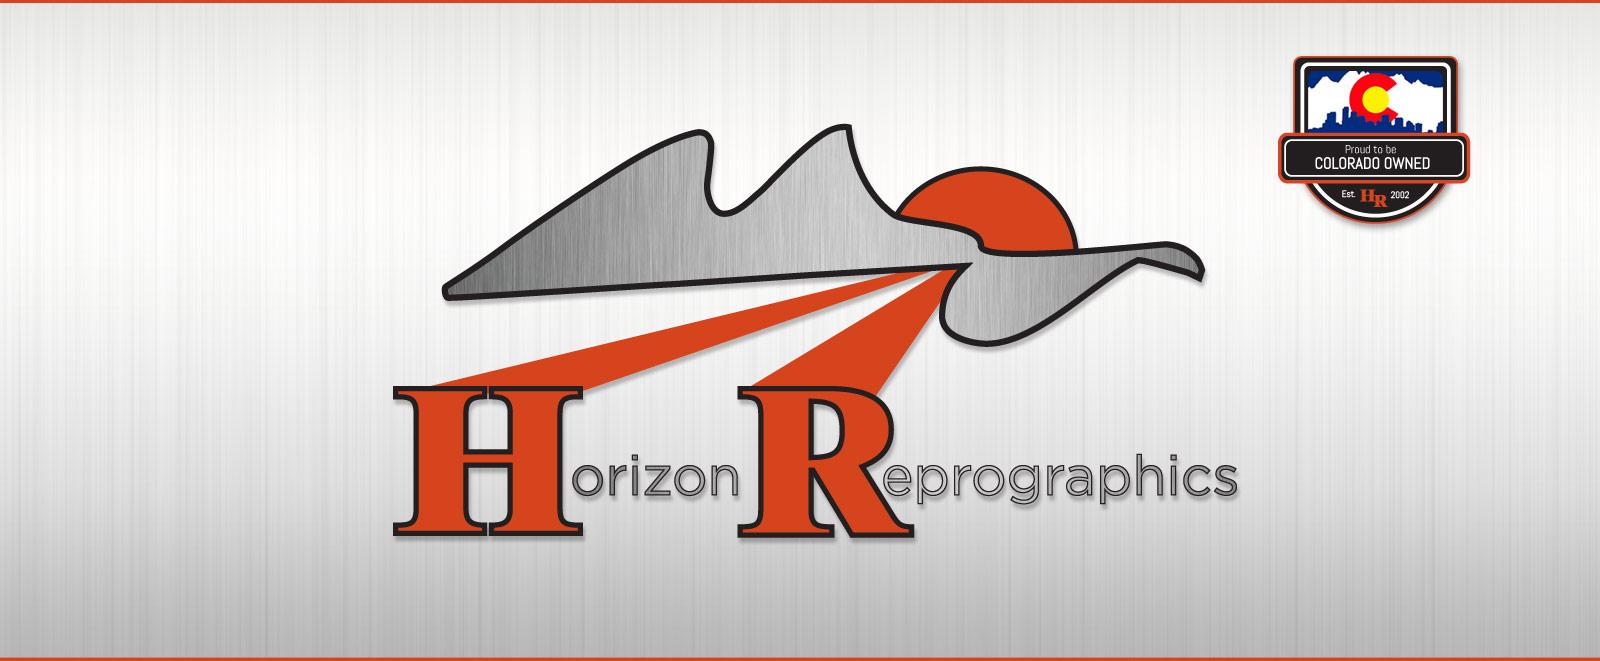 Horizon reprographics home herog malvernweather Images